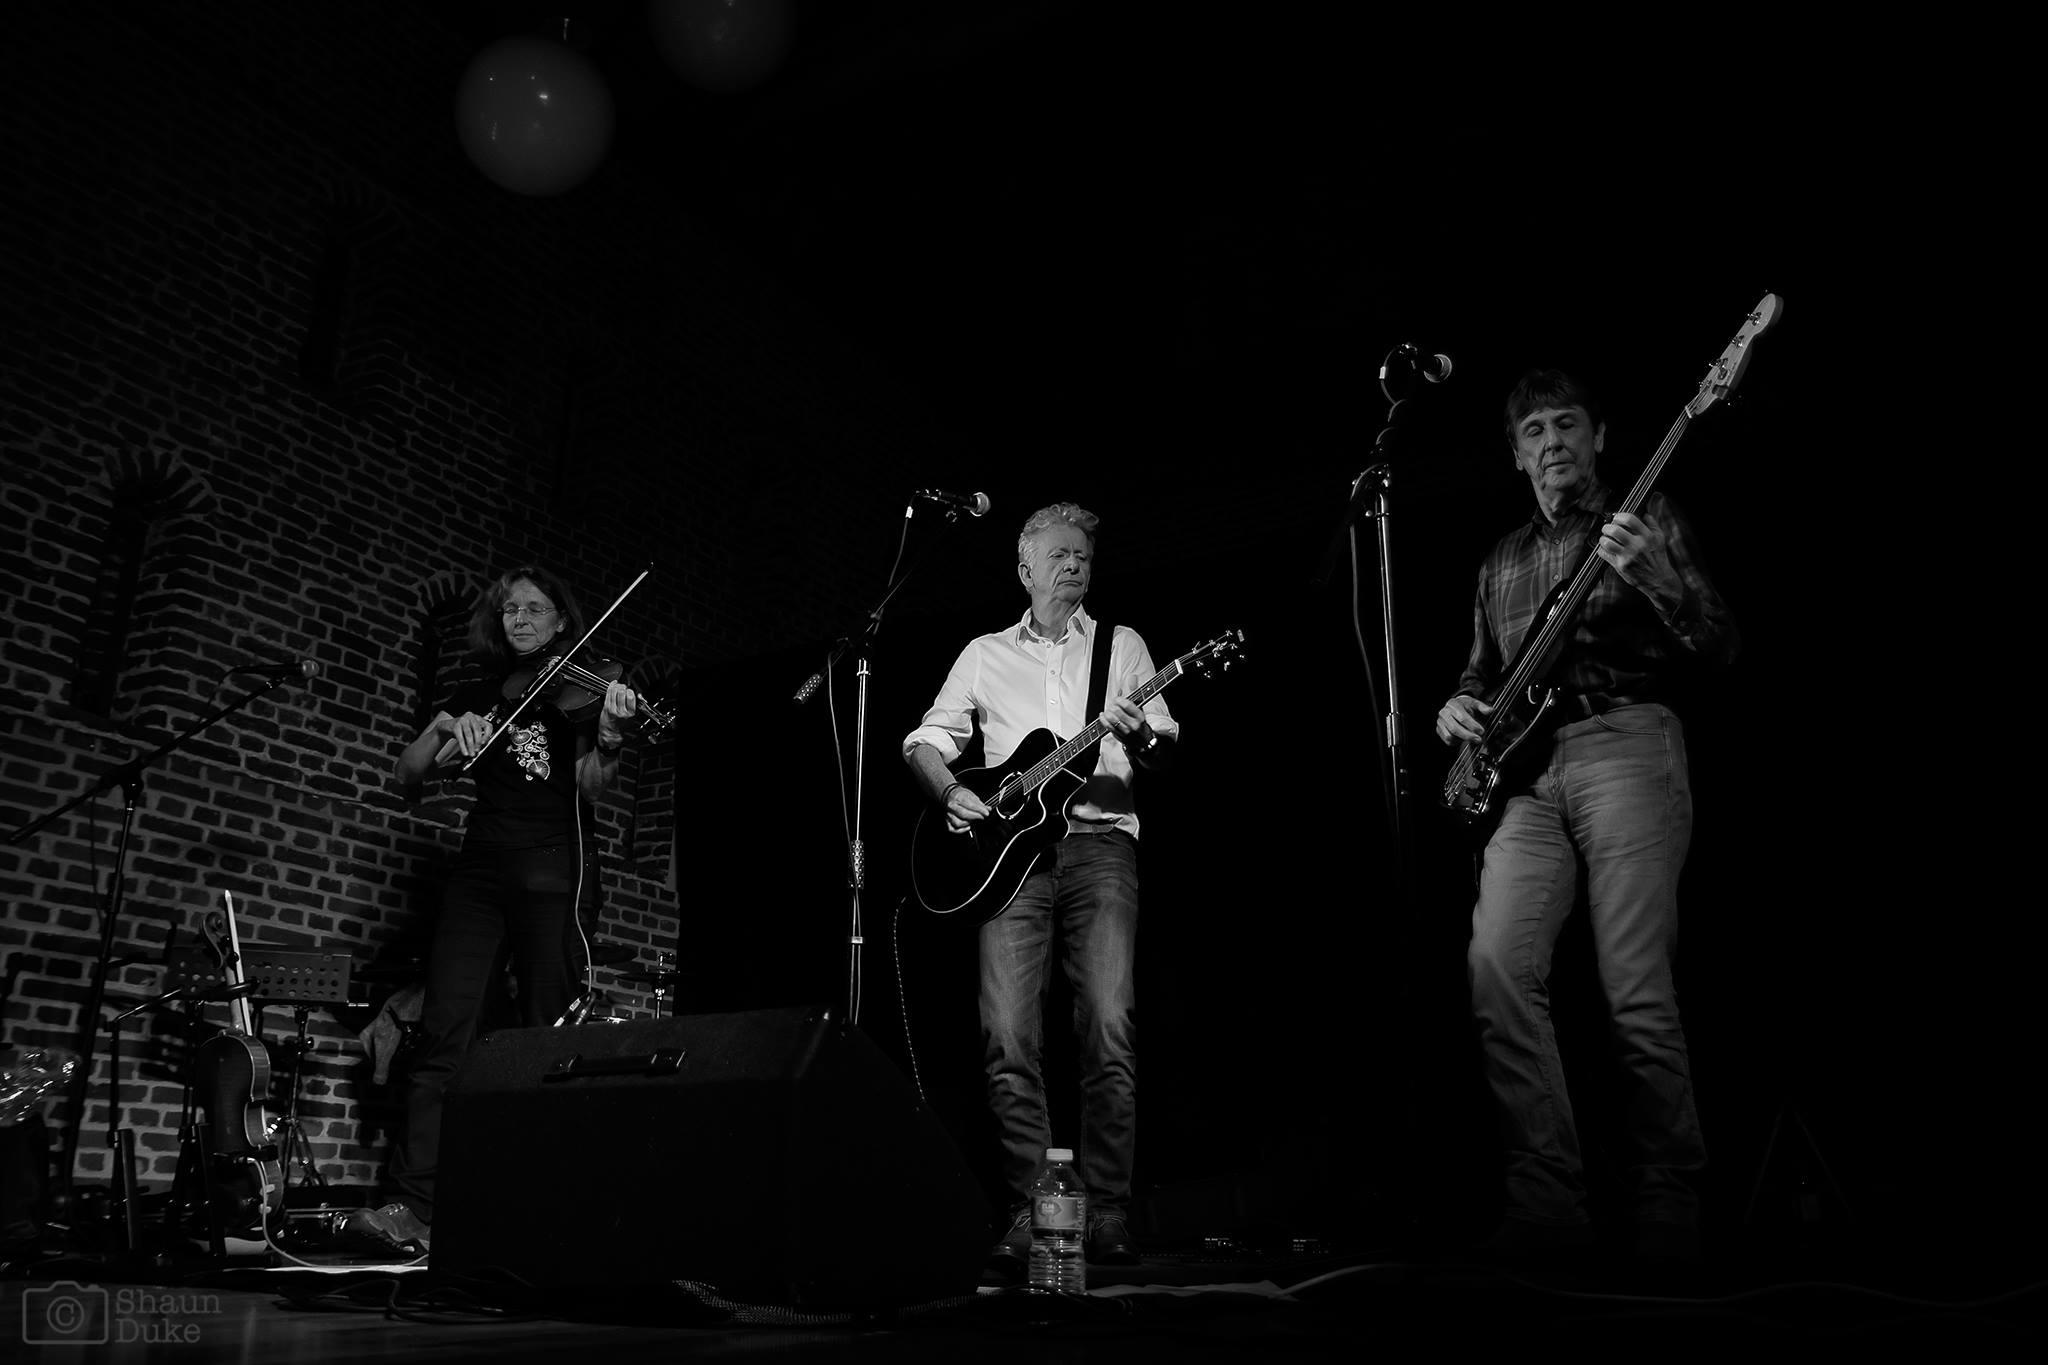 Live at The Loft. September 2018